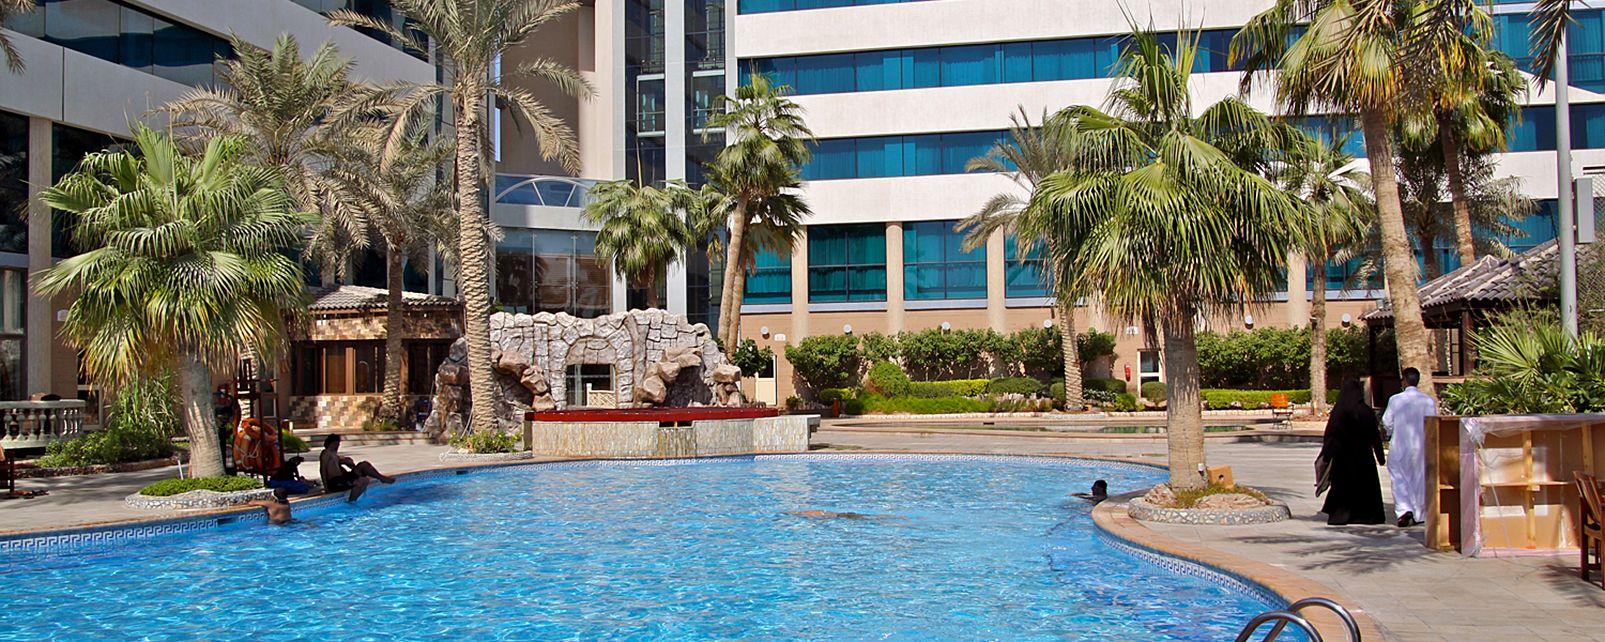 Hotel Elite Renaissance & Spa